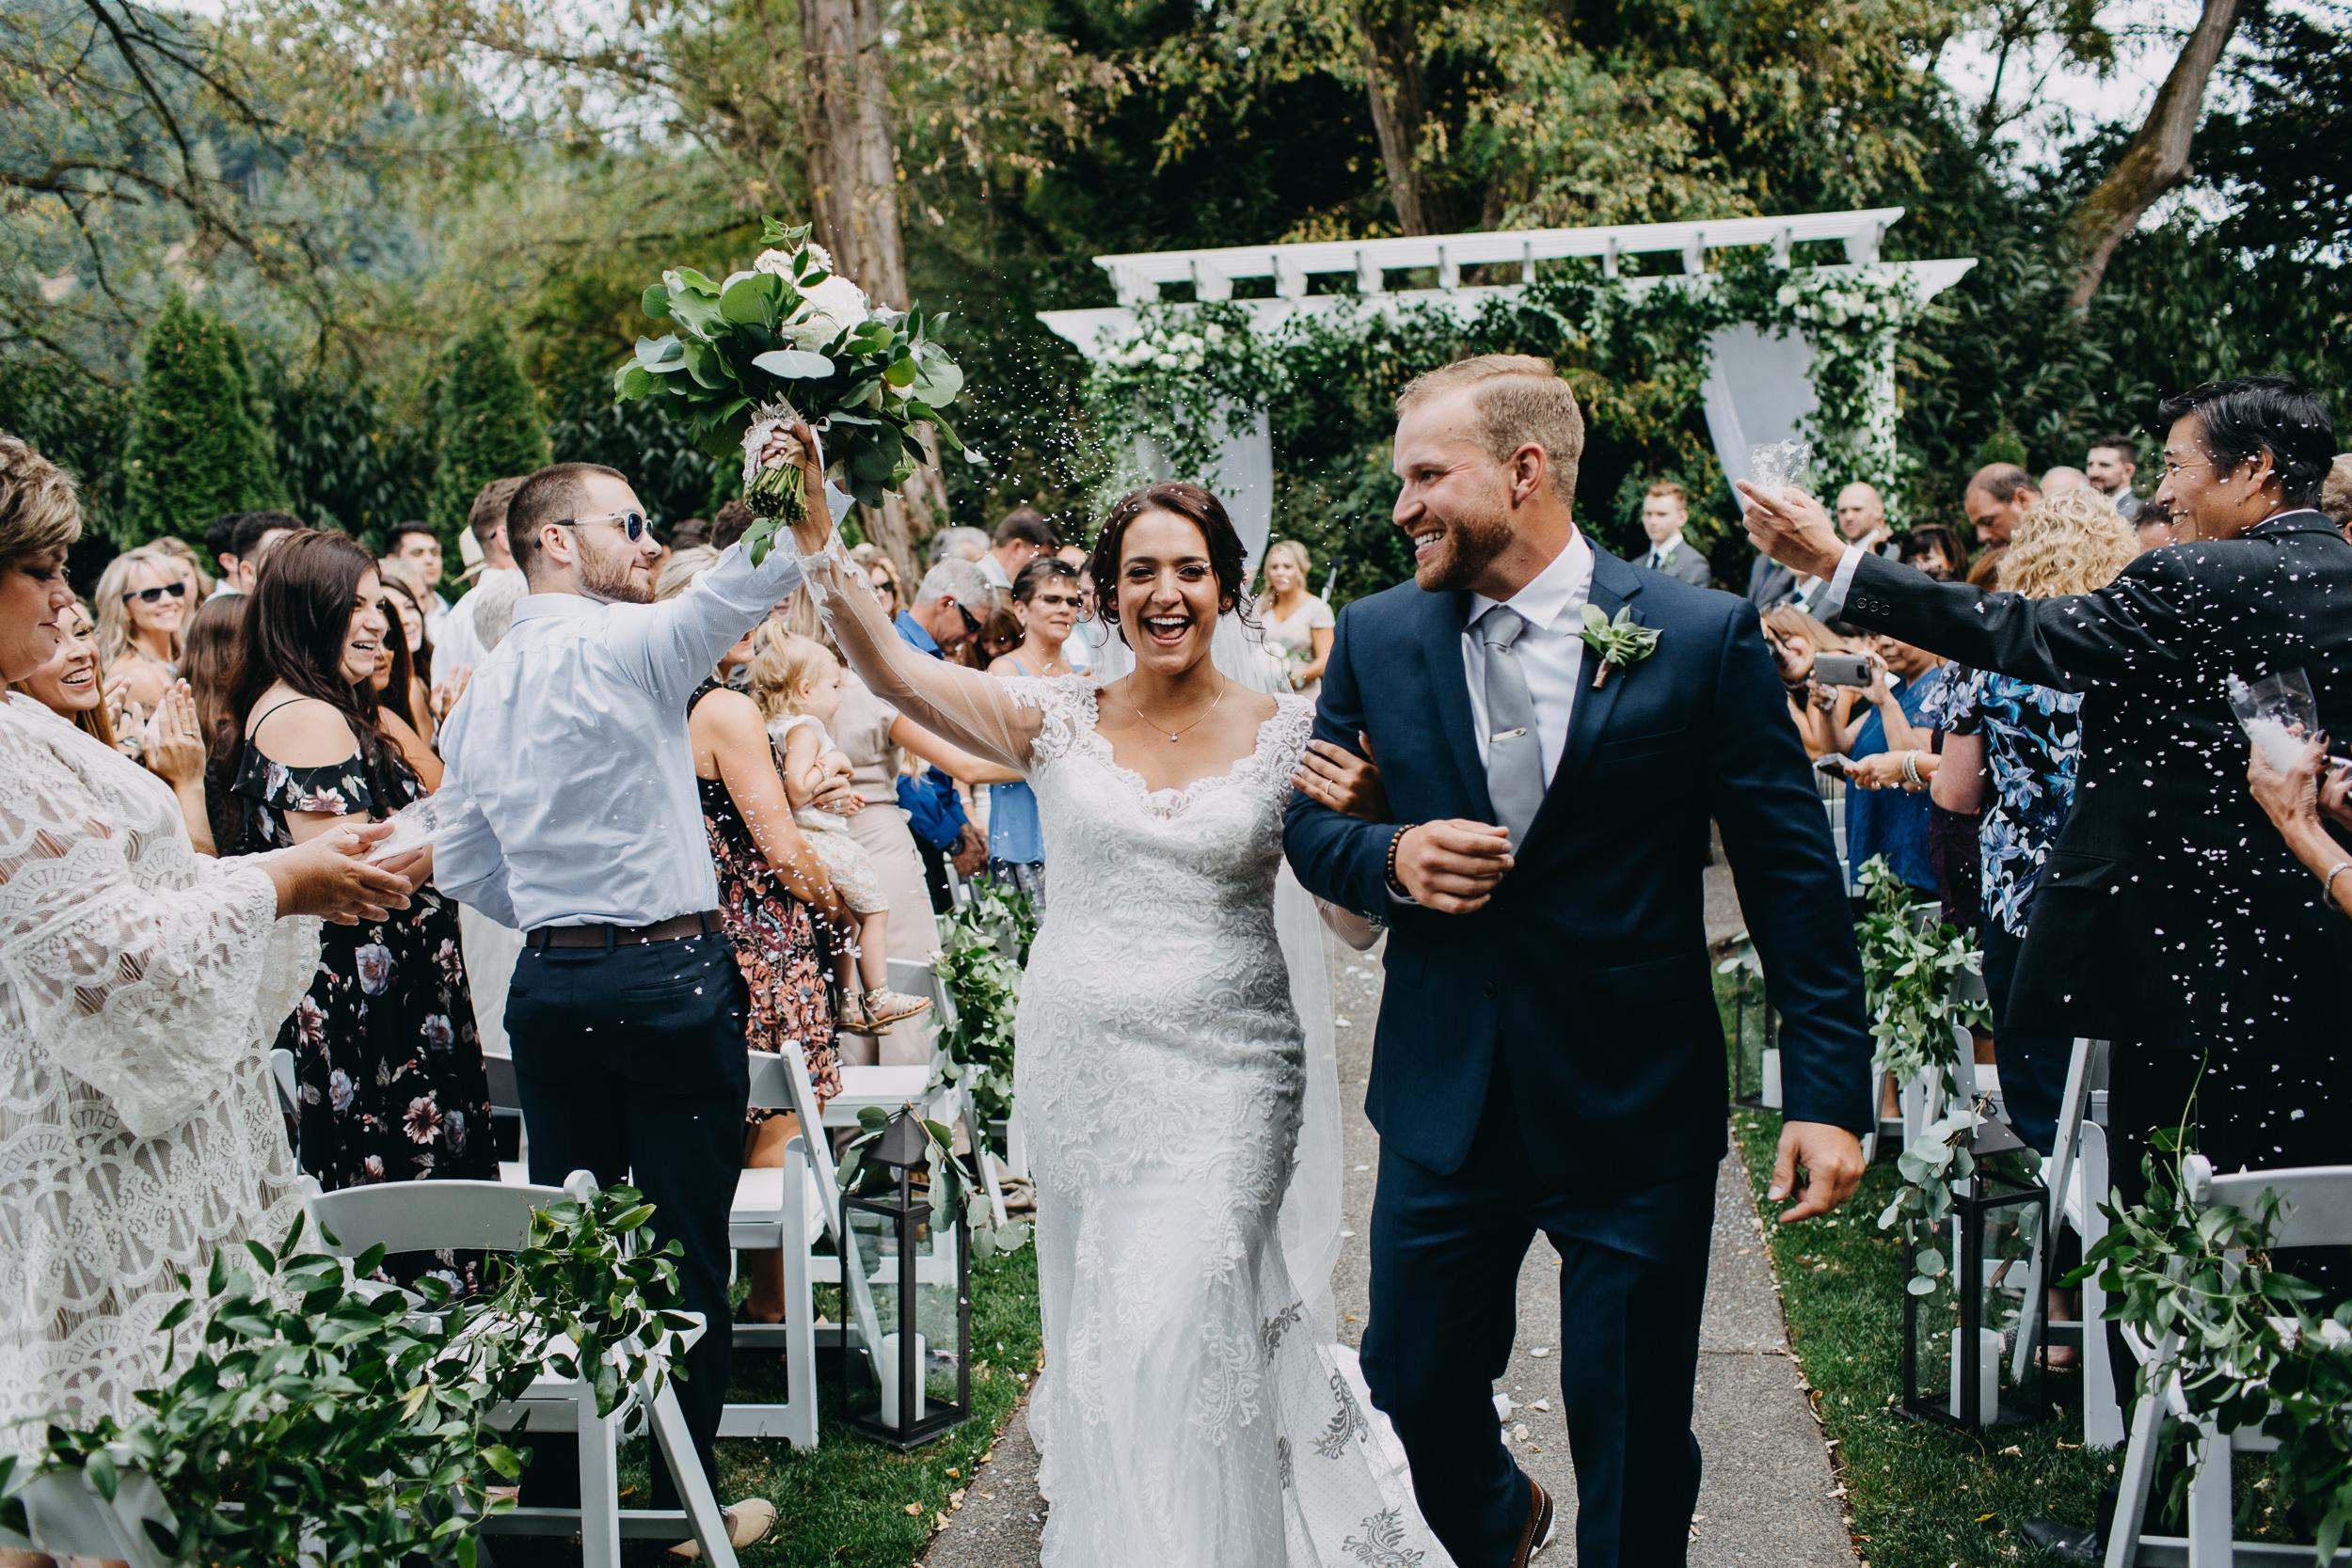 20170820 Savanna & Vince Wedding 1293.jpg